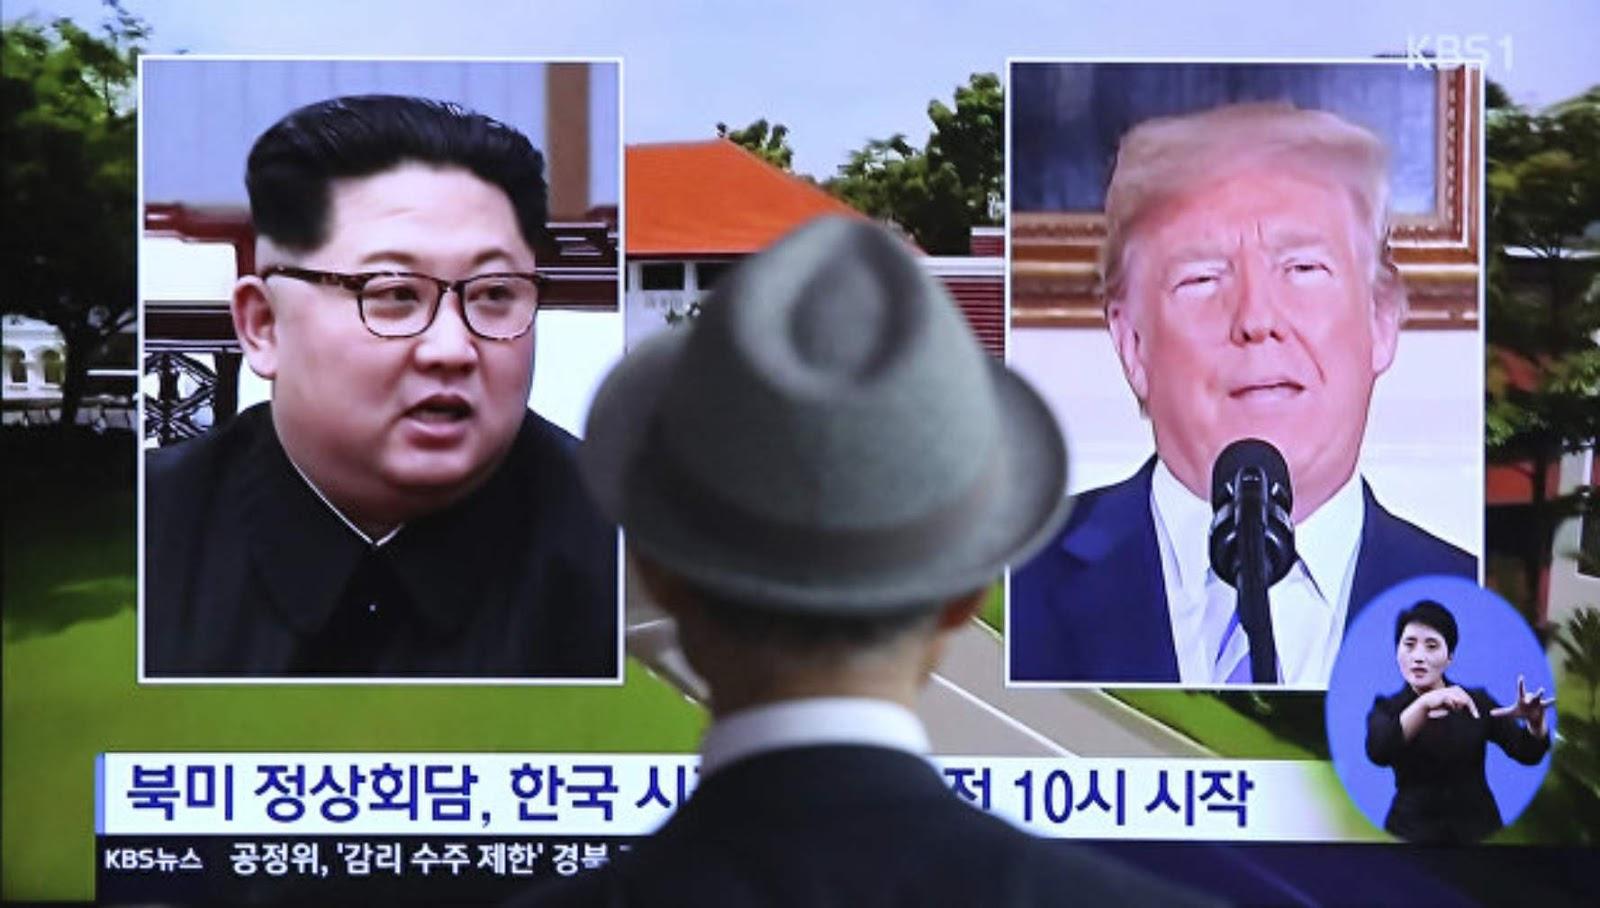 Sejarah dan dinamika hubungan antara AS dan Korea Utara